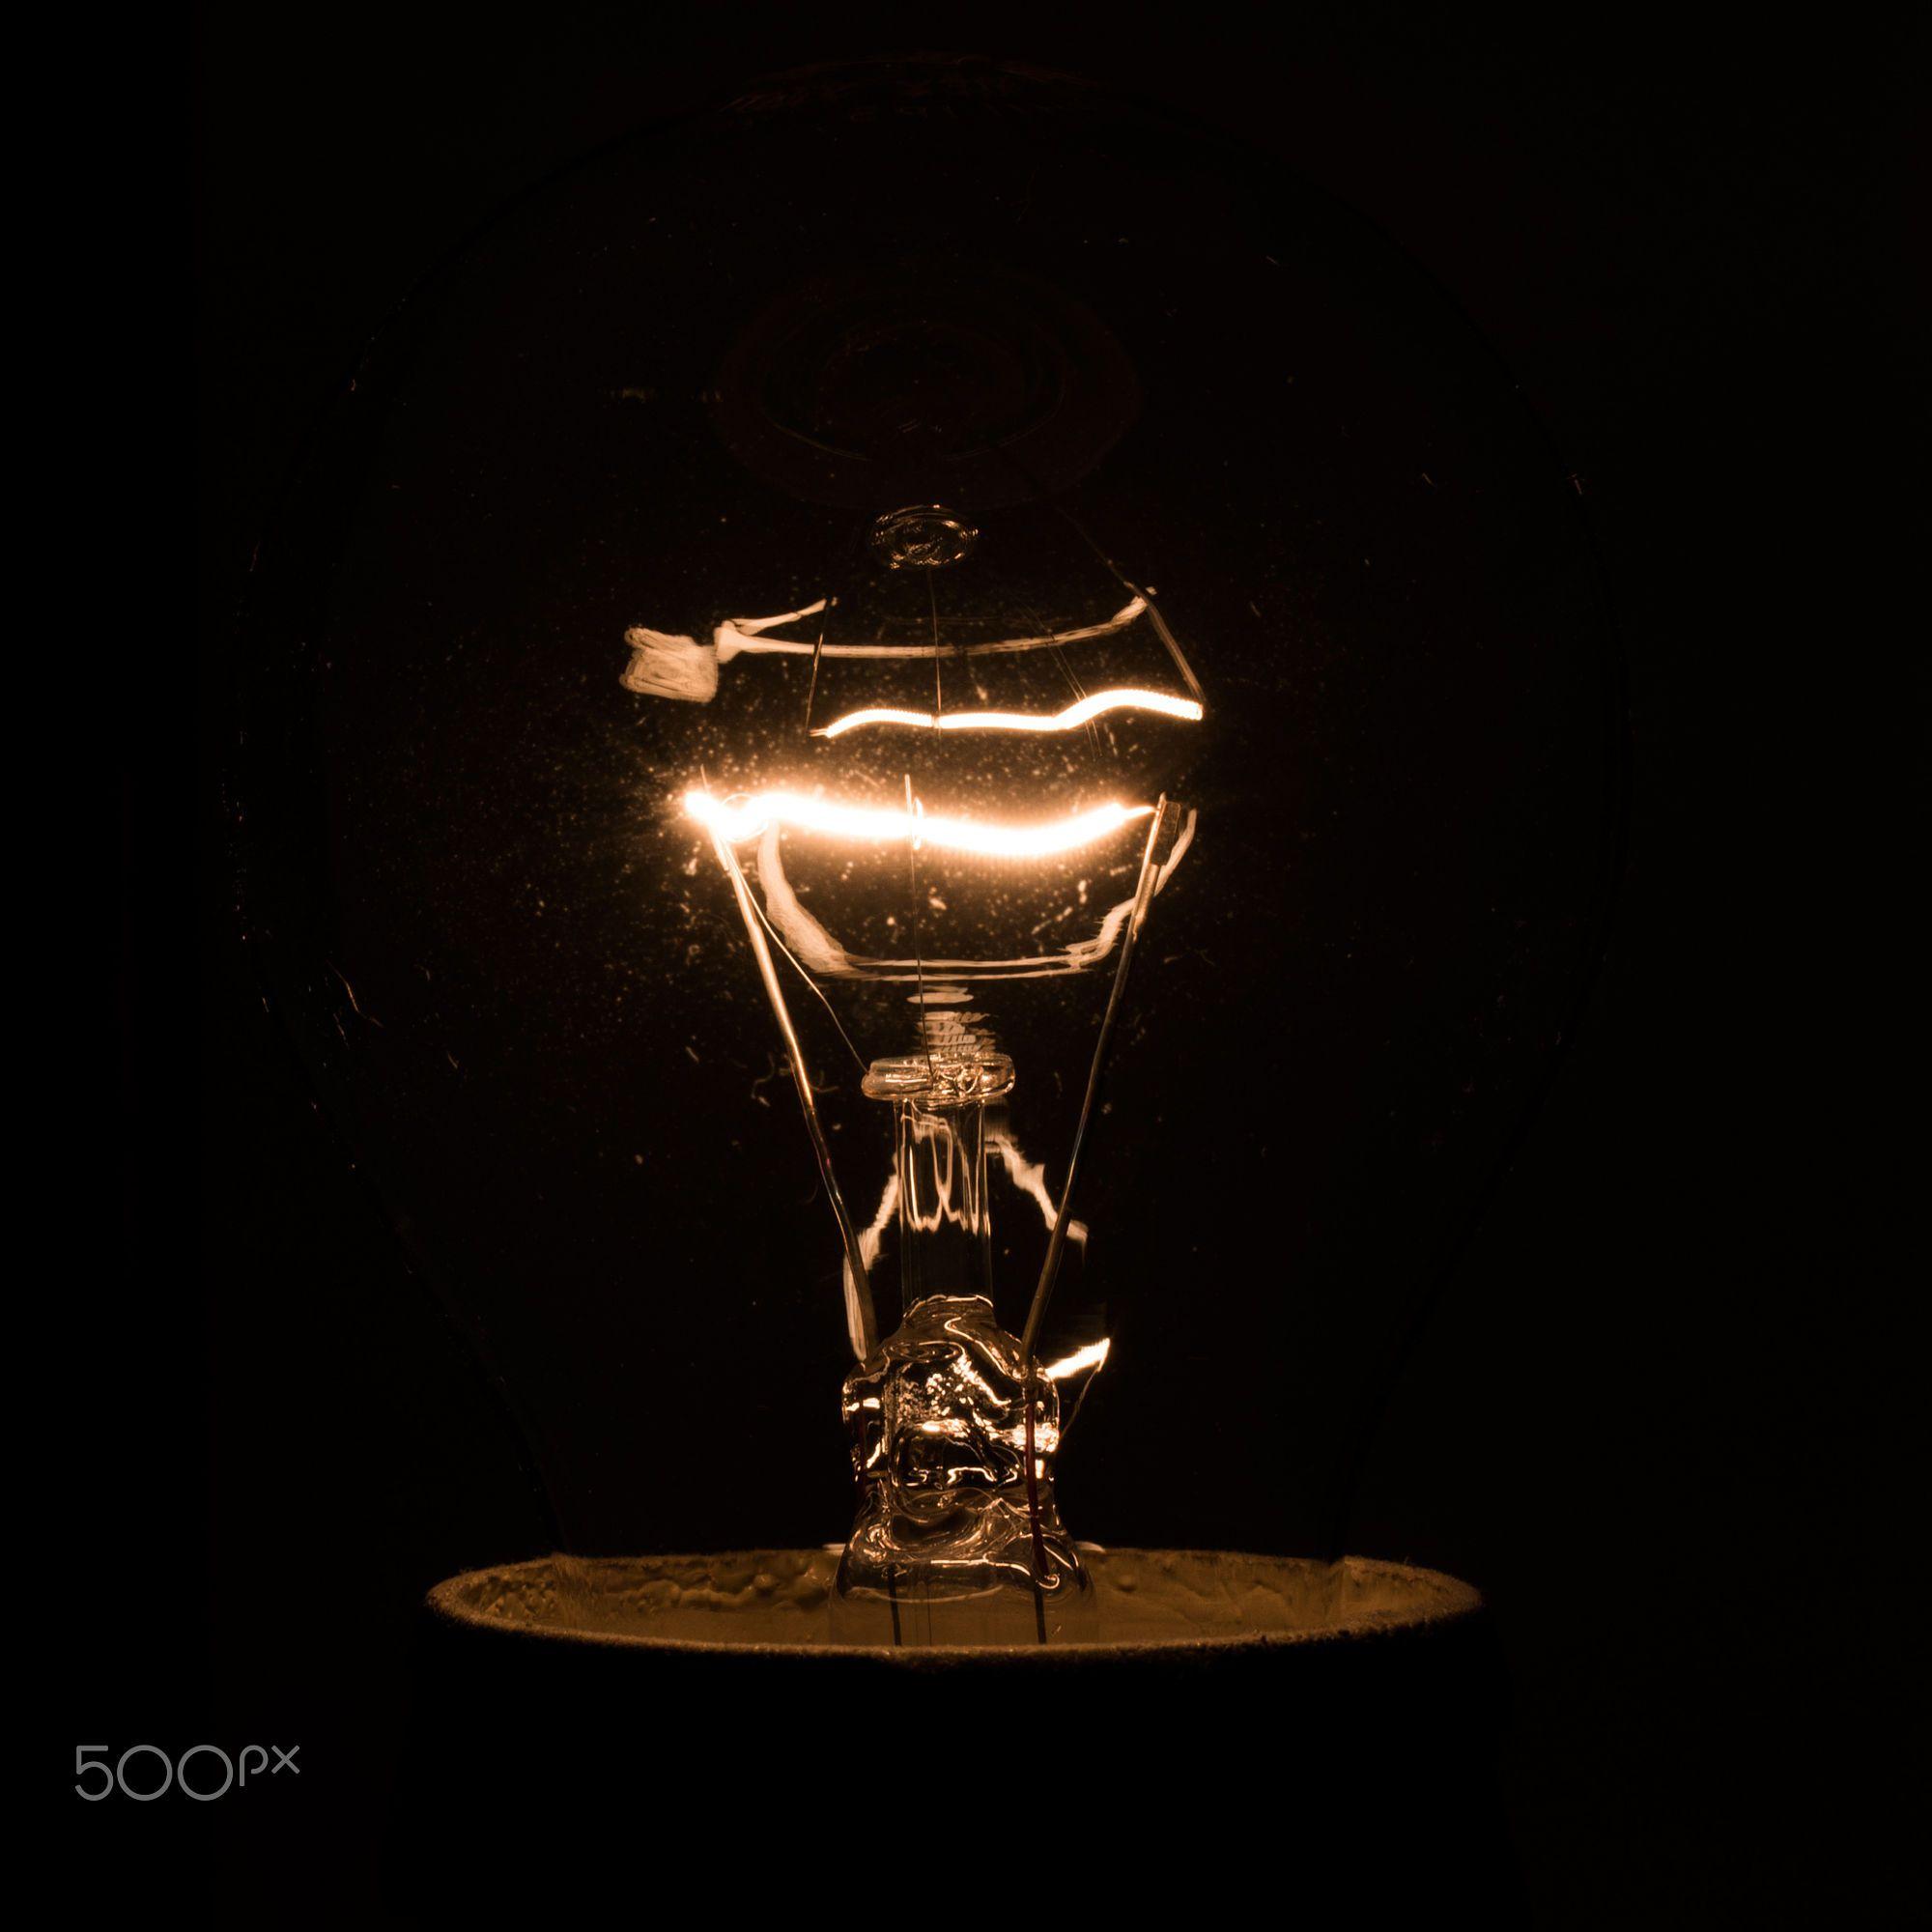 wallpapers photography bulbs and hd light of pin beautiful qhd lights